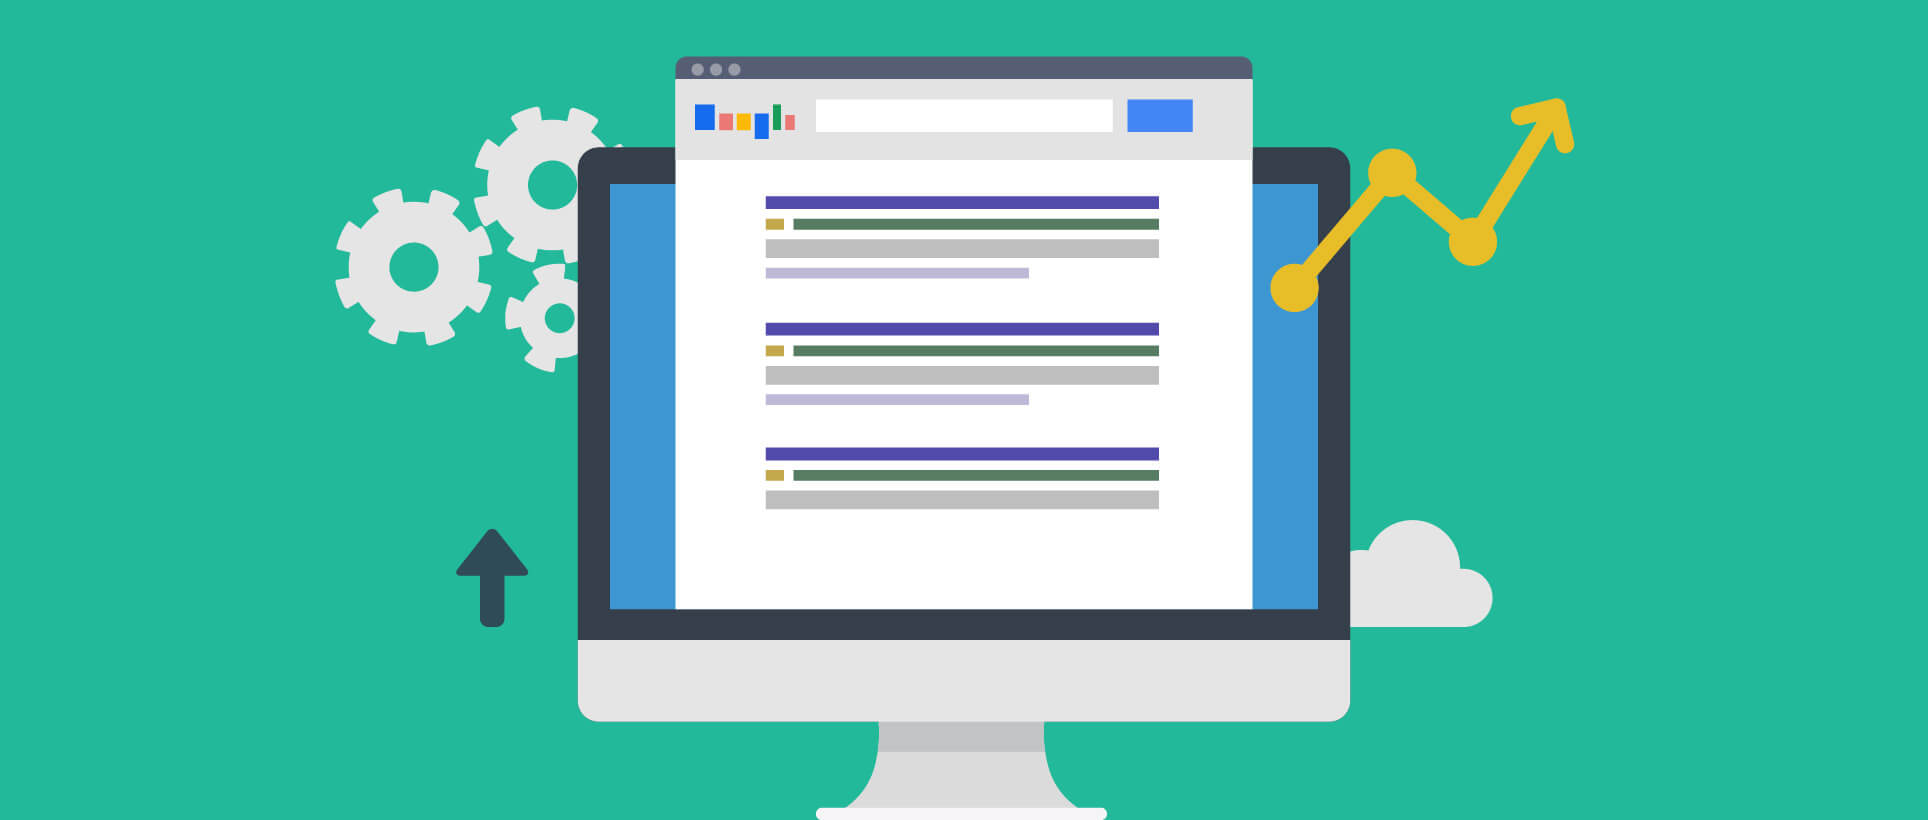 7 ways to improve search engine rank